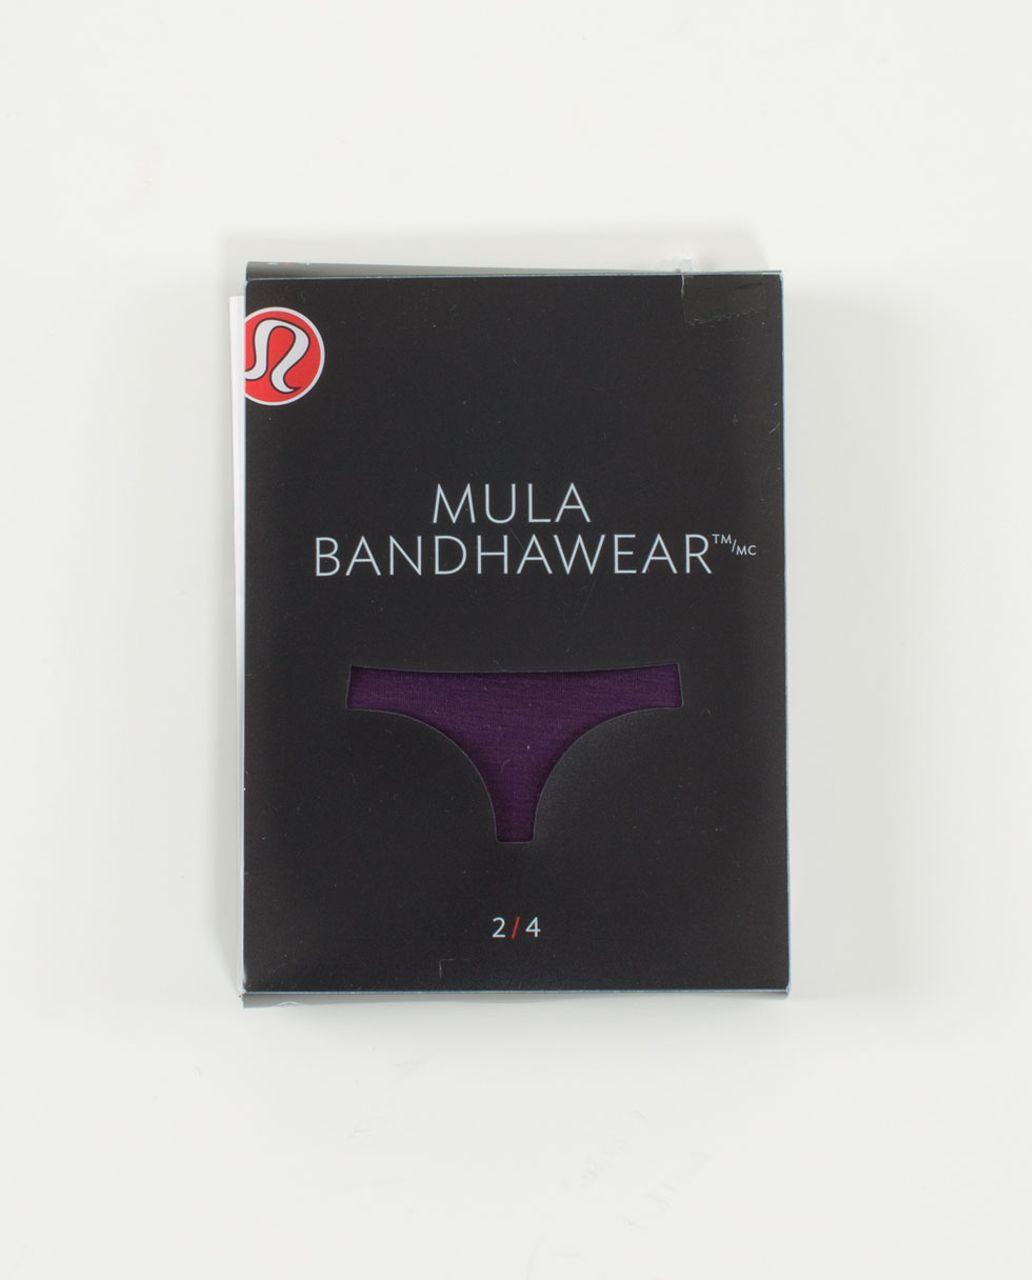 Lululemon Mula Bandhawear Thong - Deep Zinfandel / Black